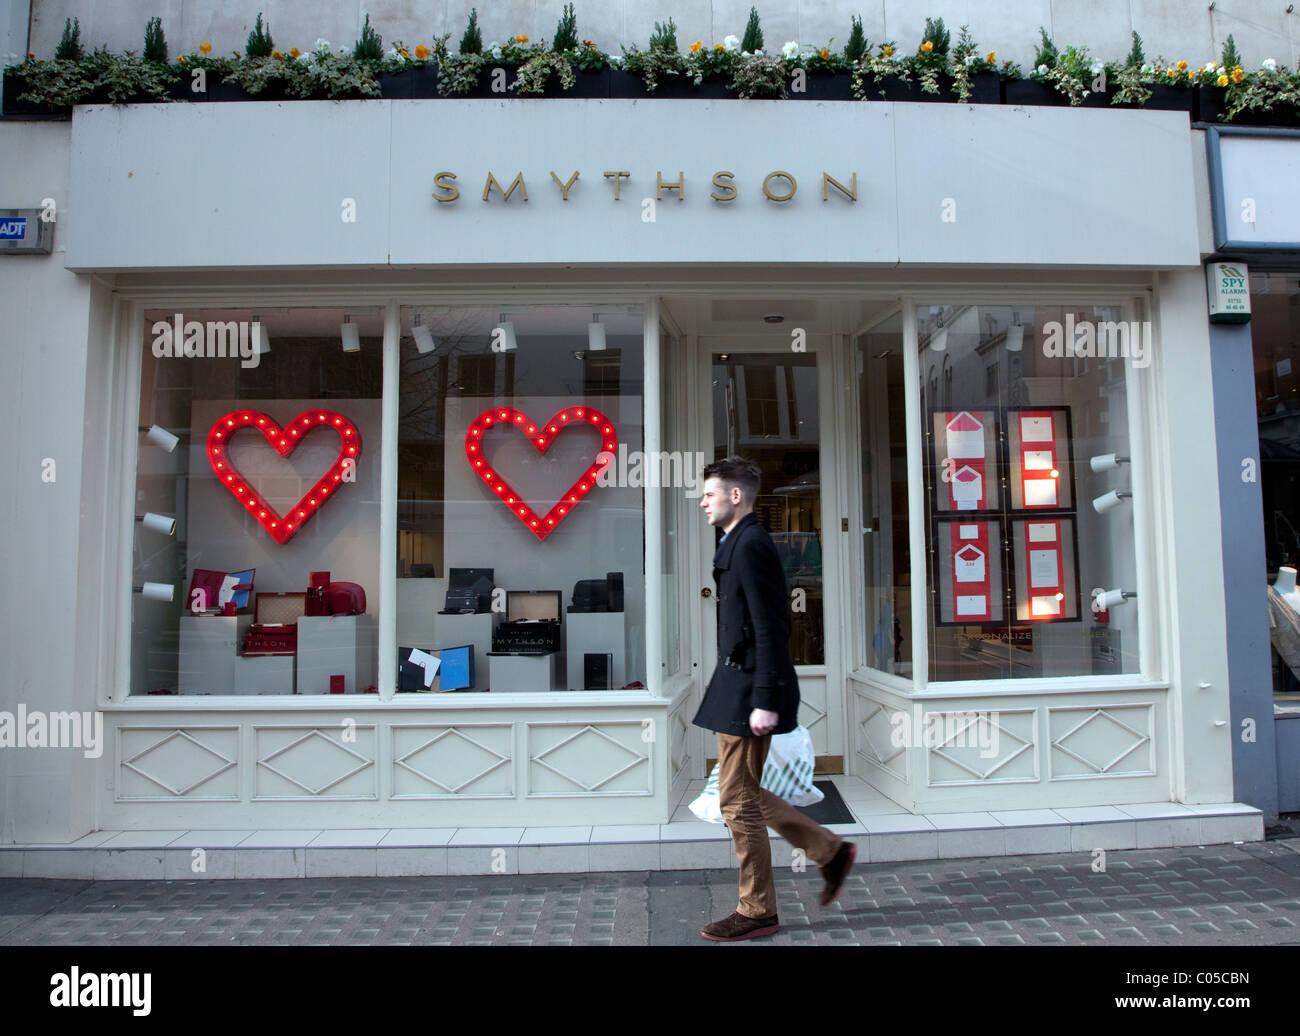 Branch of Smythson stationers, Sloane Street, London - Stock Image